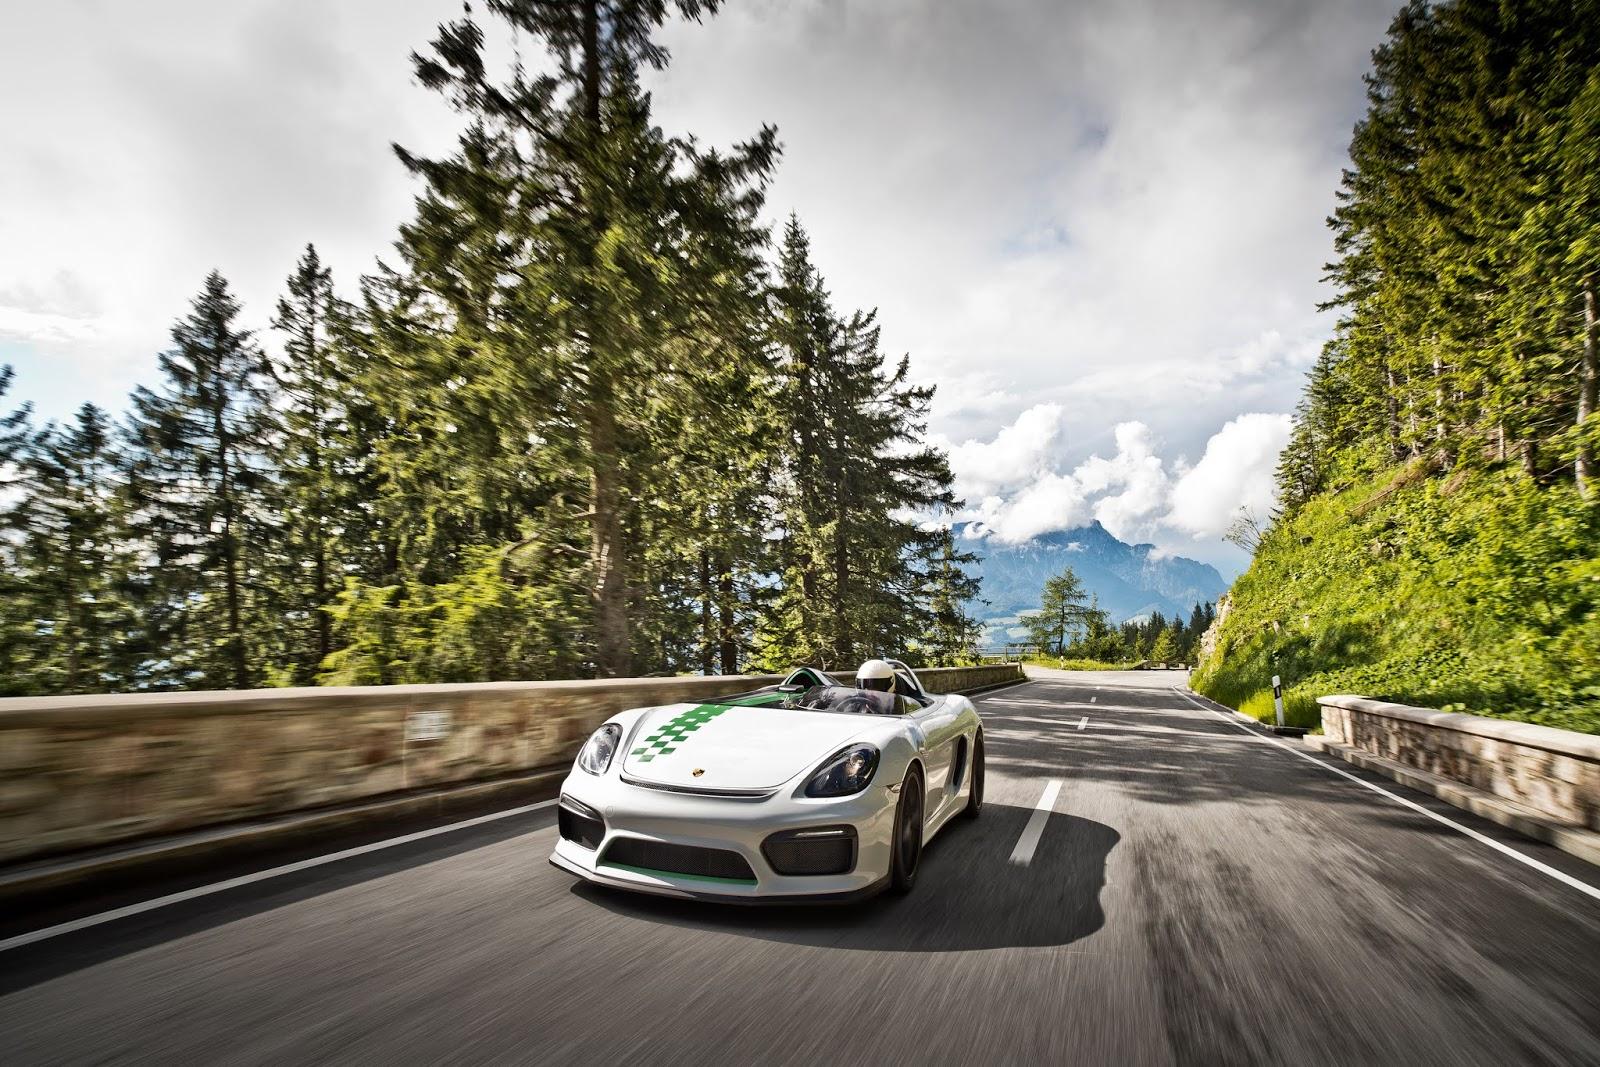 POR3483 Boxster Bergspyder : Η sprinter των Άλπεων Boxster Bergspyder, Porsche, Porsche Boxster, Porsche Unseen, Spin-offs, Sunday, zblog